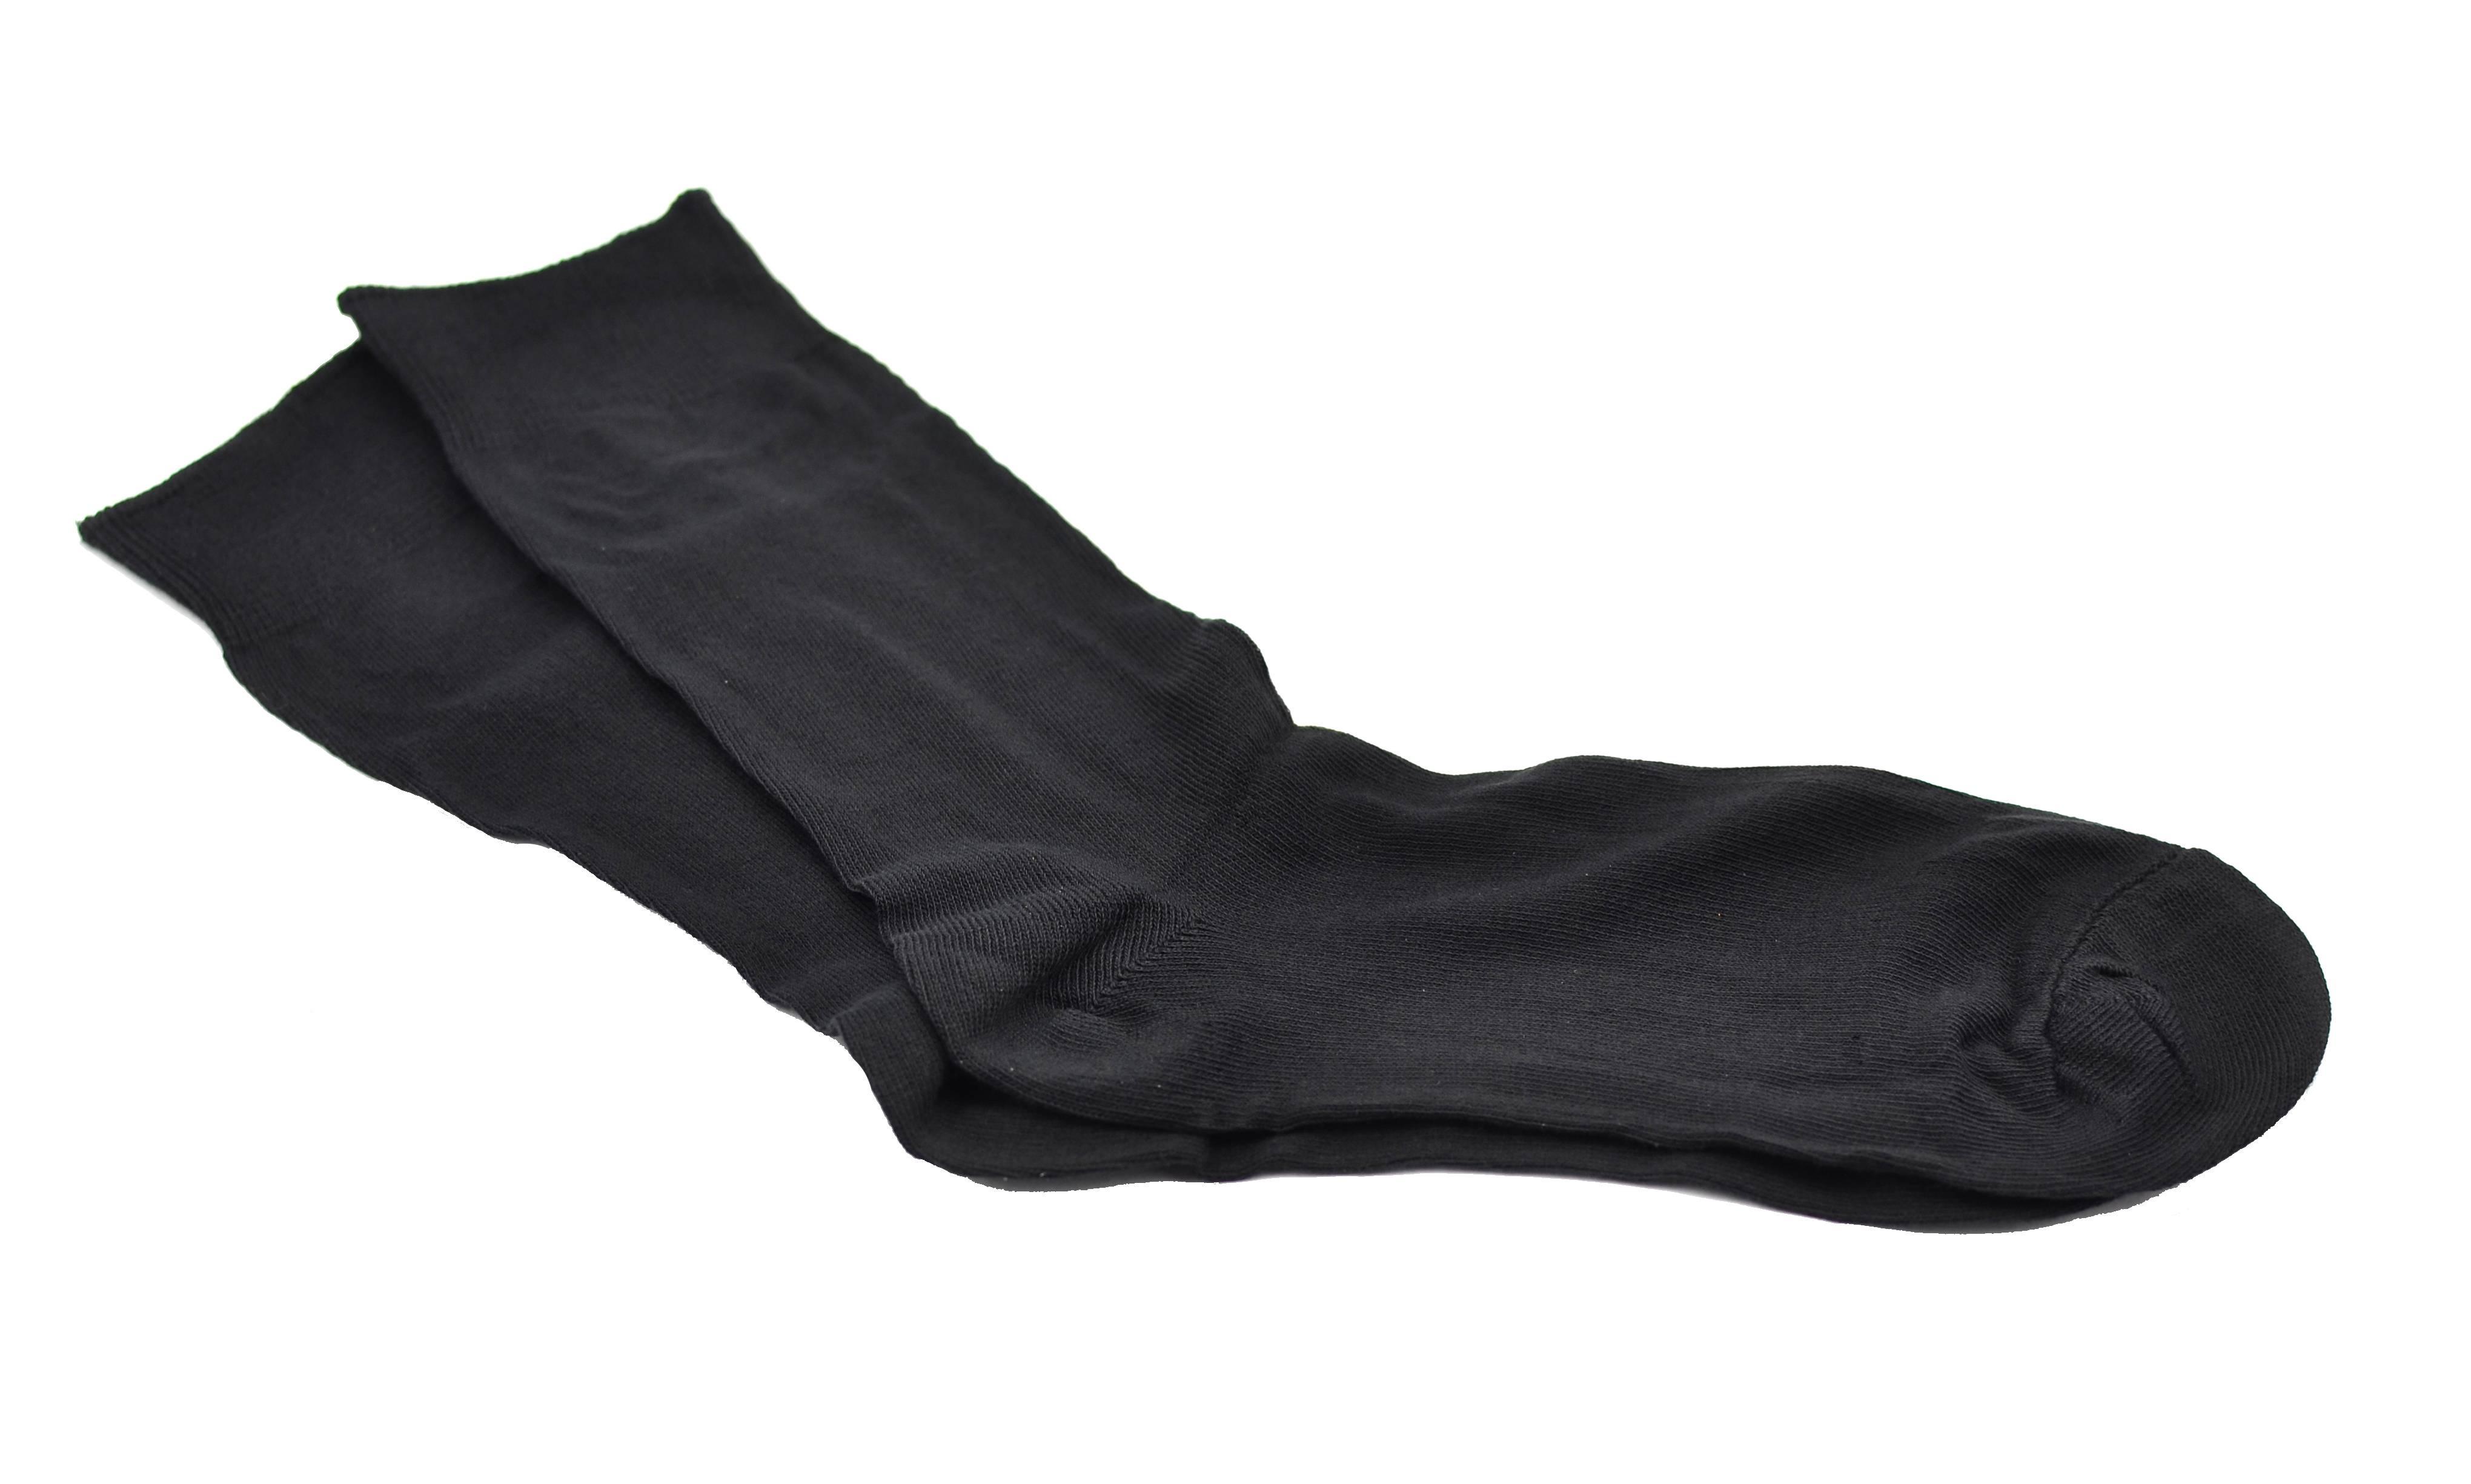 Sosete negre barbati pentru costum, 5 perechi, bumbac 100% - Sibiu, Romania SB361N